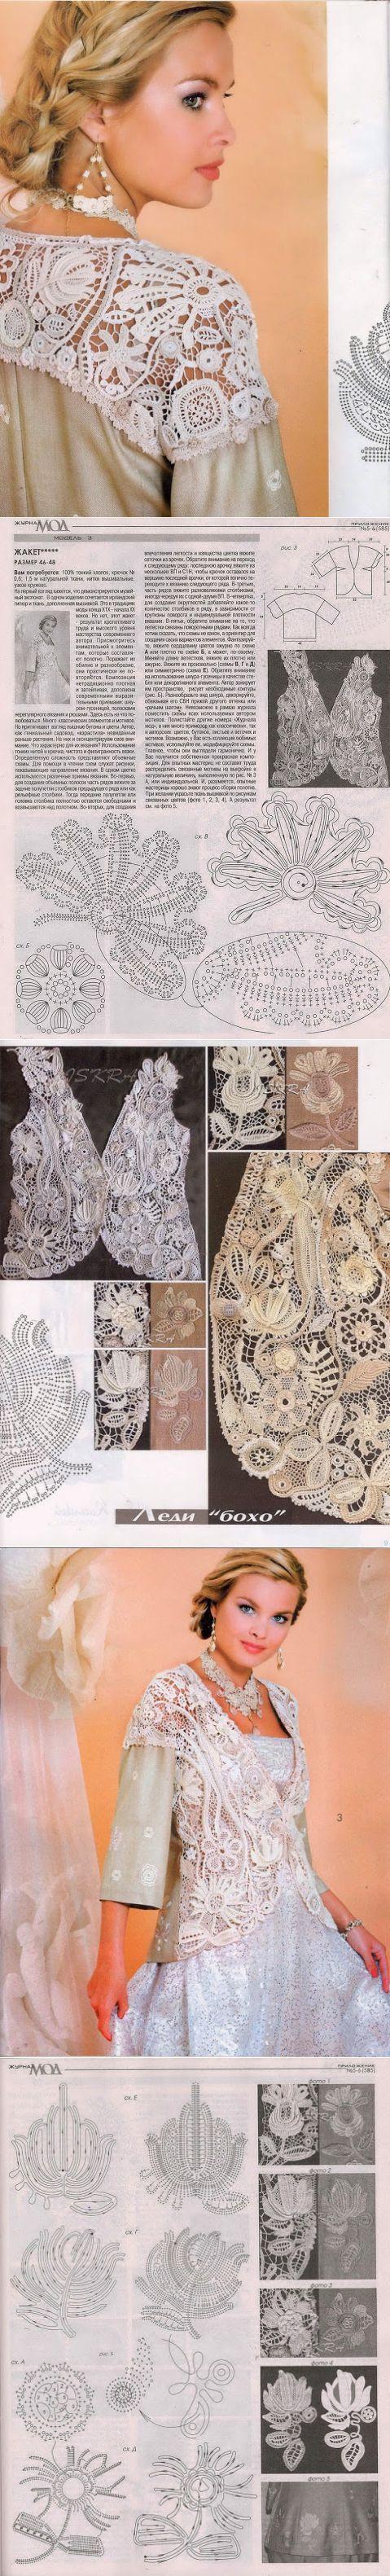 "Irish crochet &: Jacket ""Lady BOHO"""